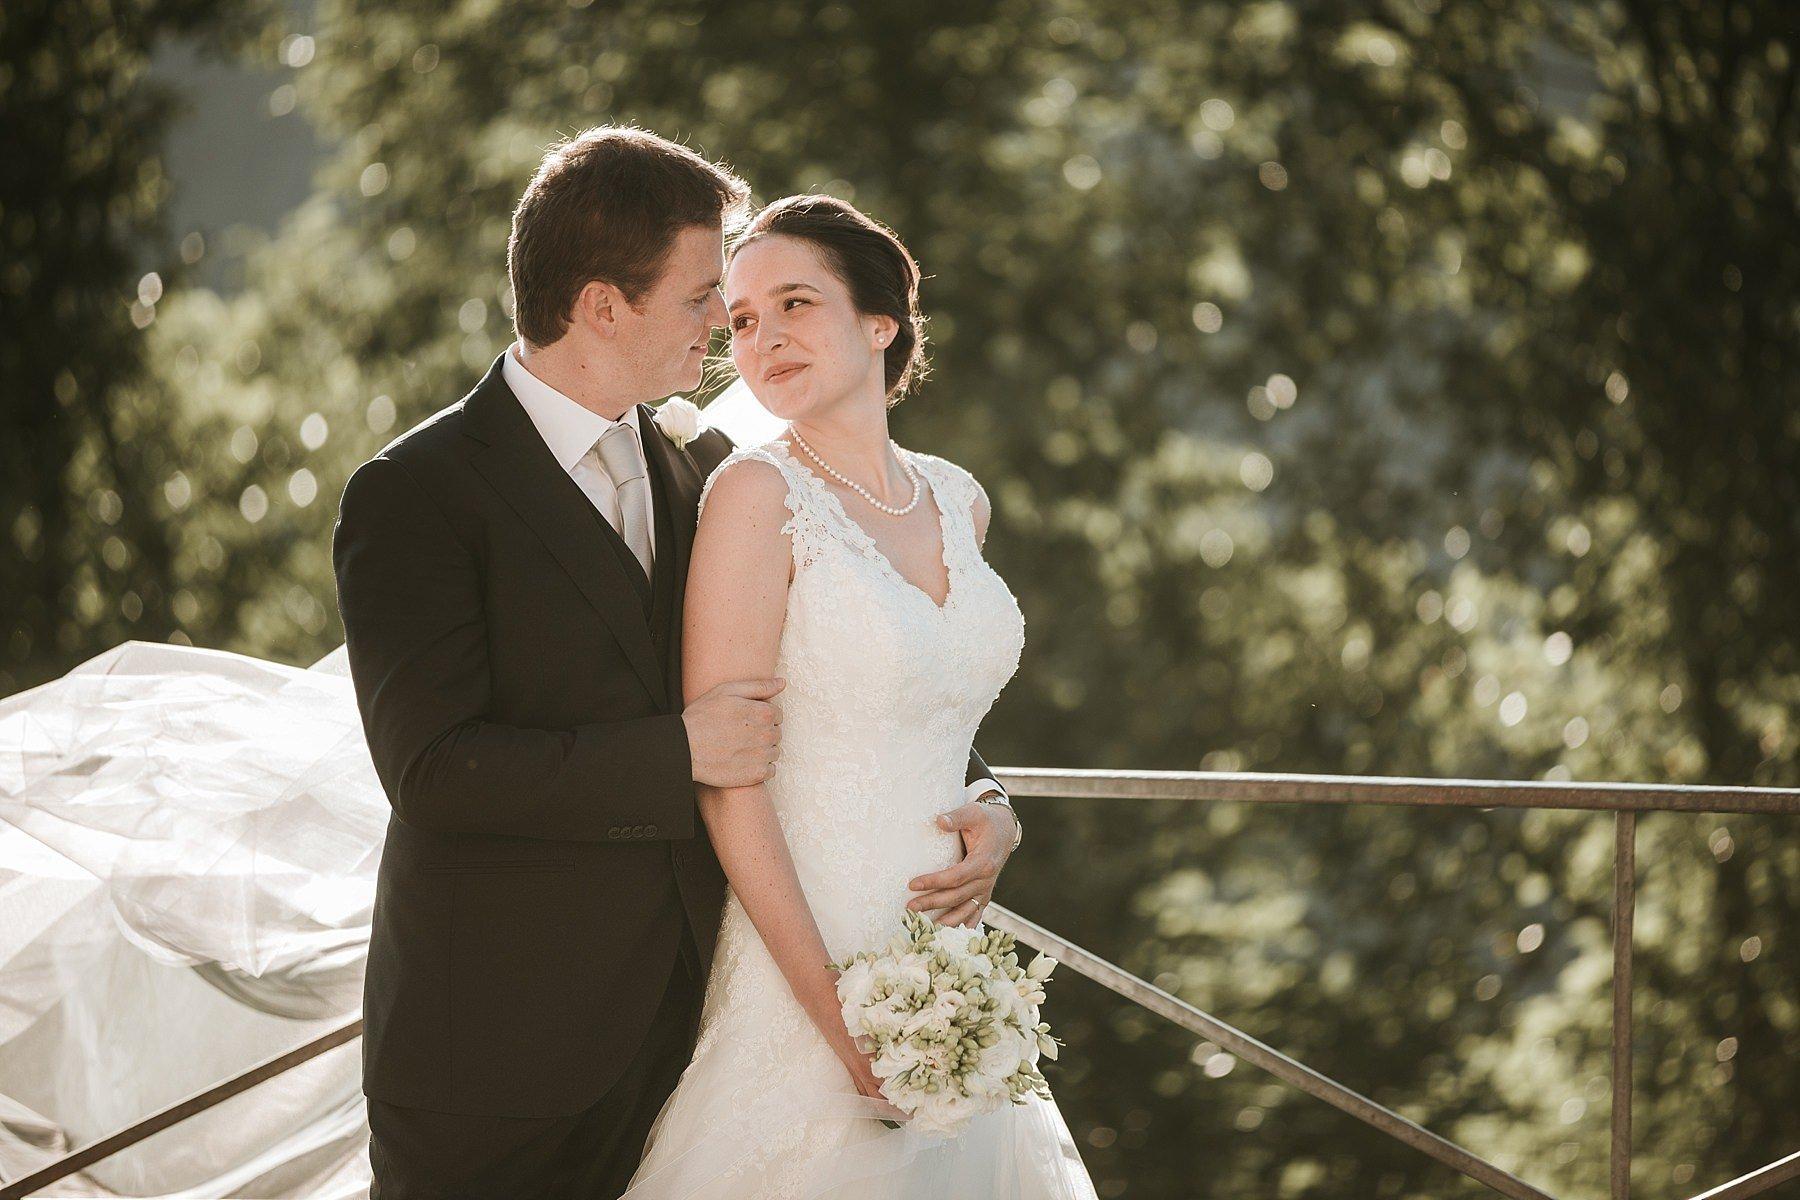 Fotografia di sposi a Pistoia in controluce